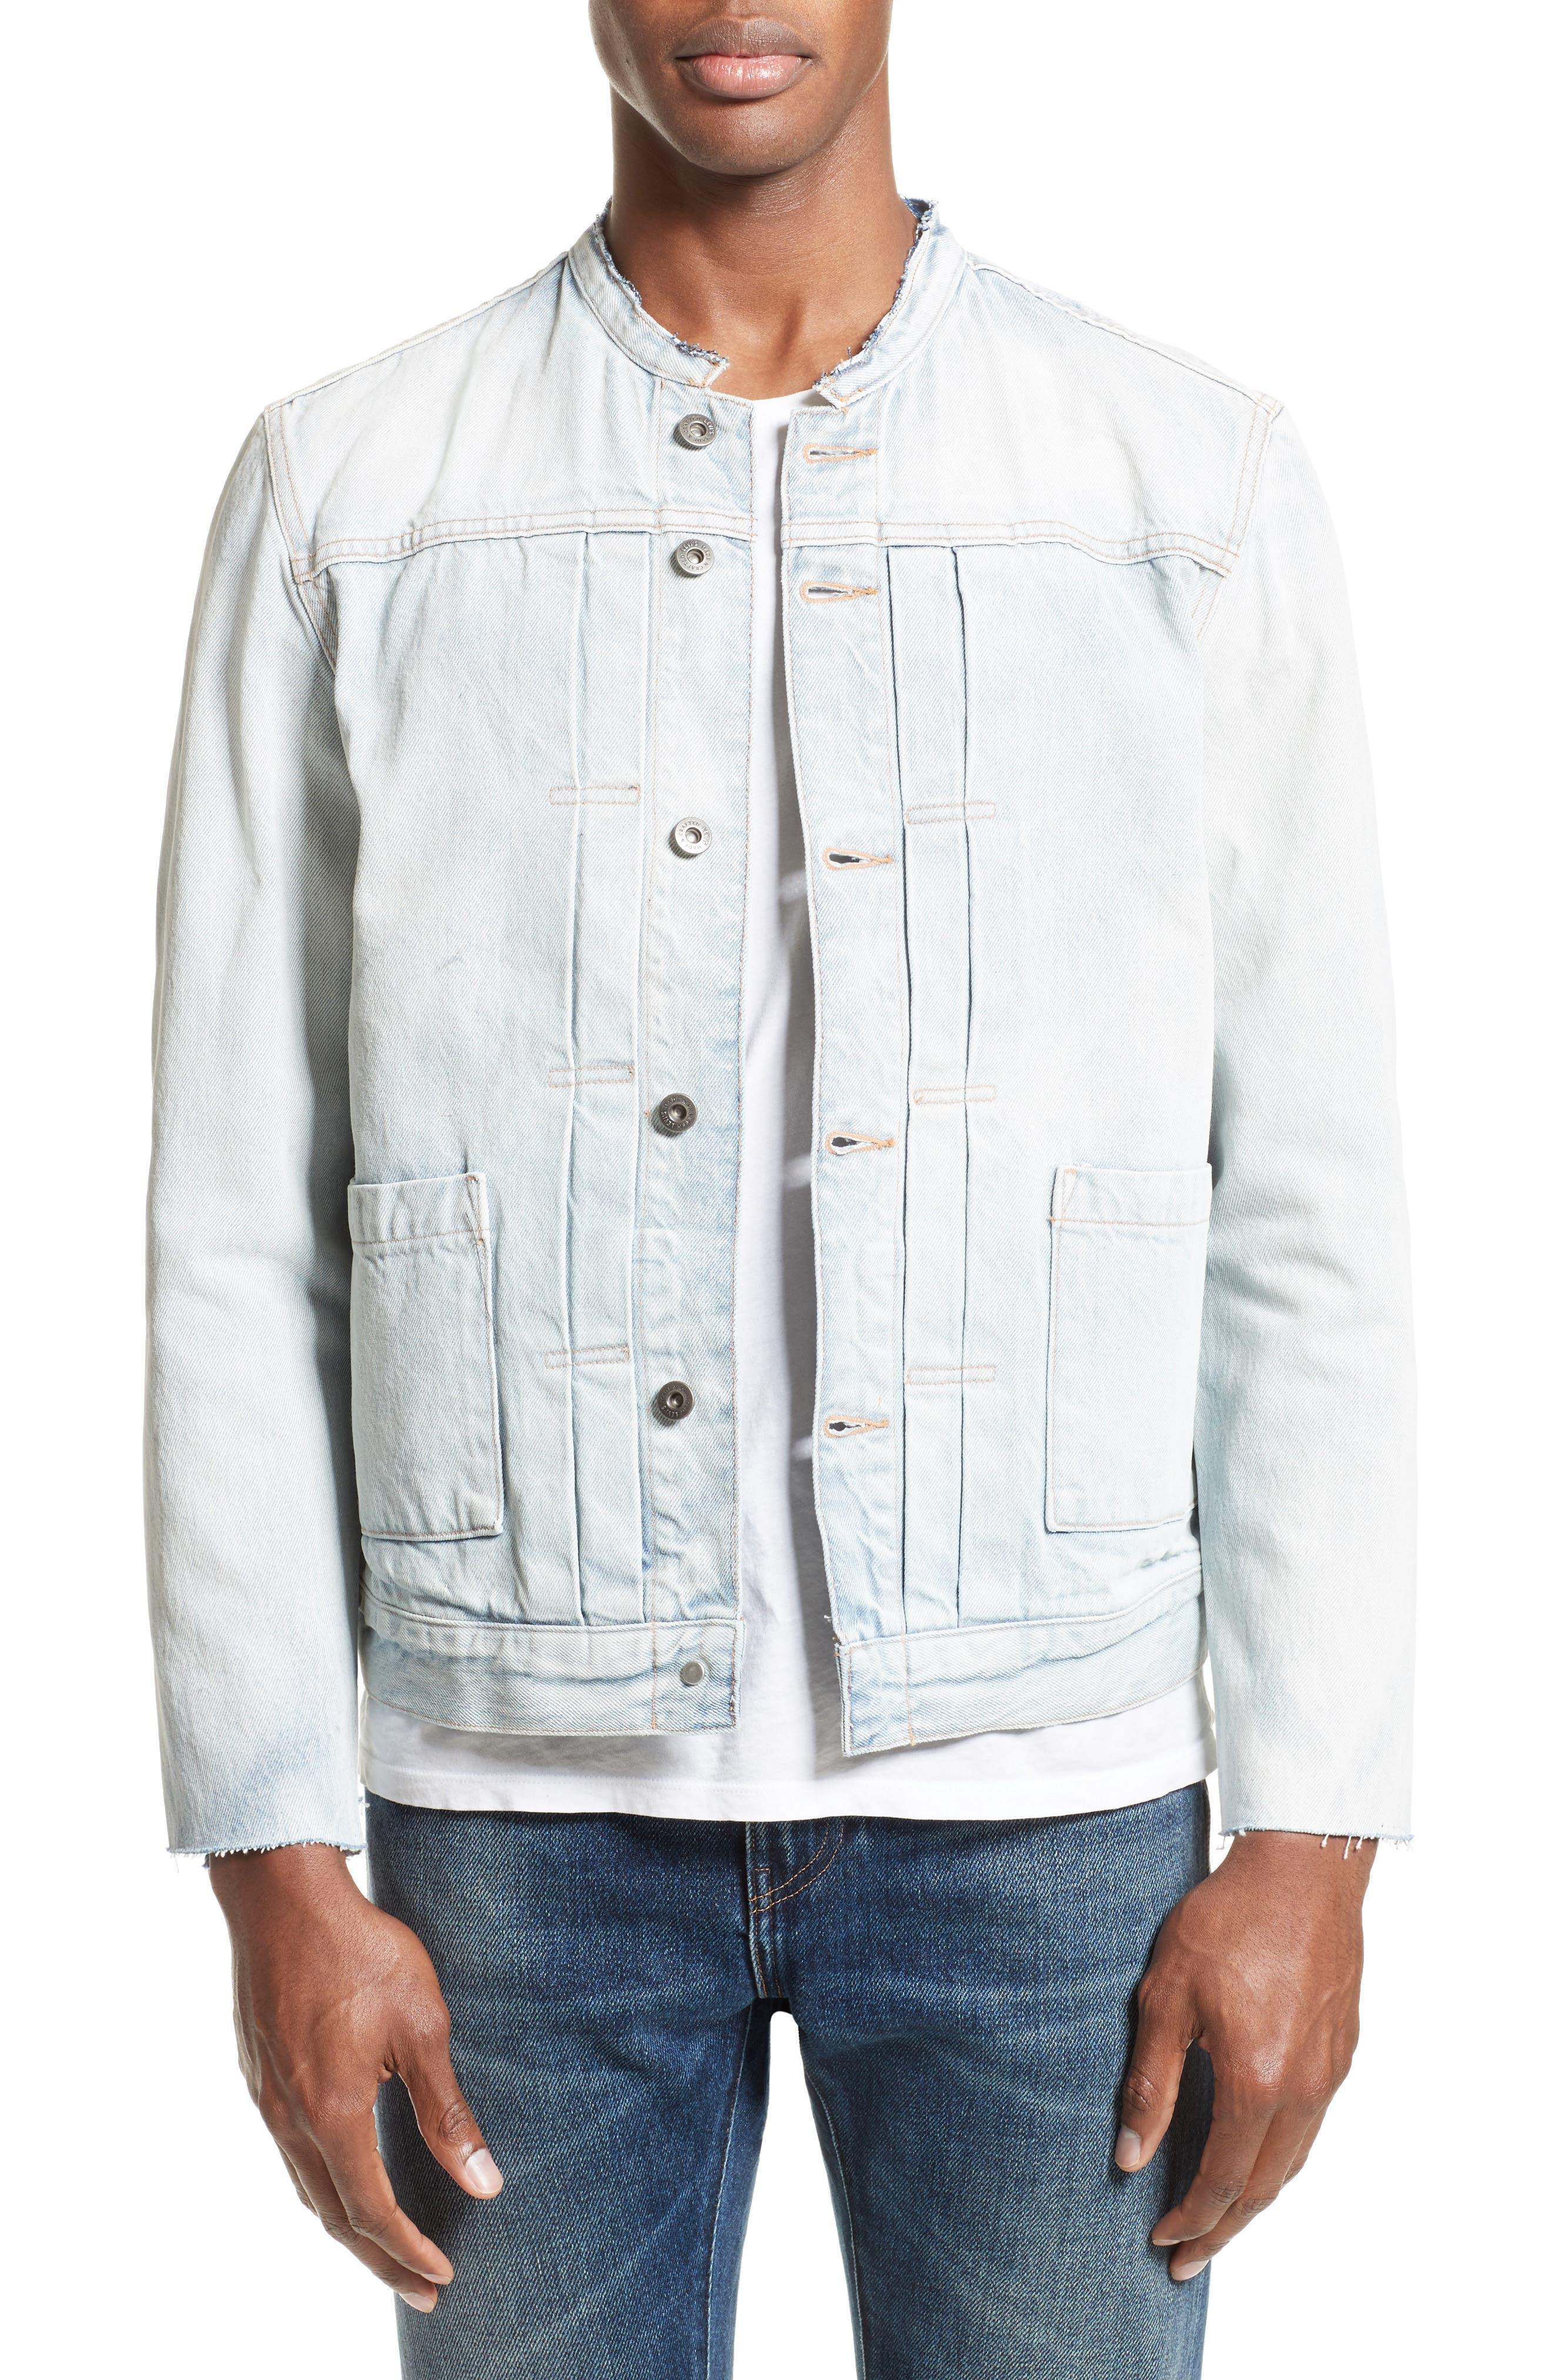 Alternate Image 1 Selected - Levi's® Made & Crafted™ Type II Trucker Raw Edge Denim Jacket